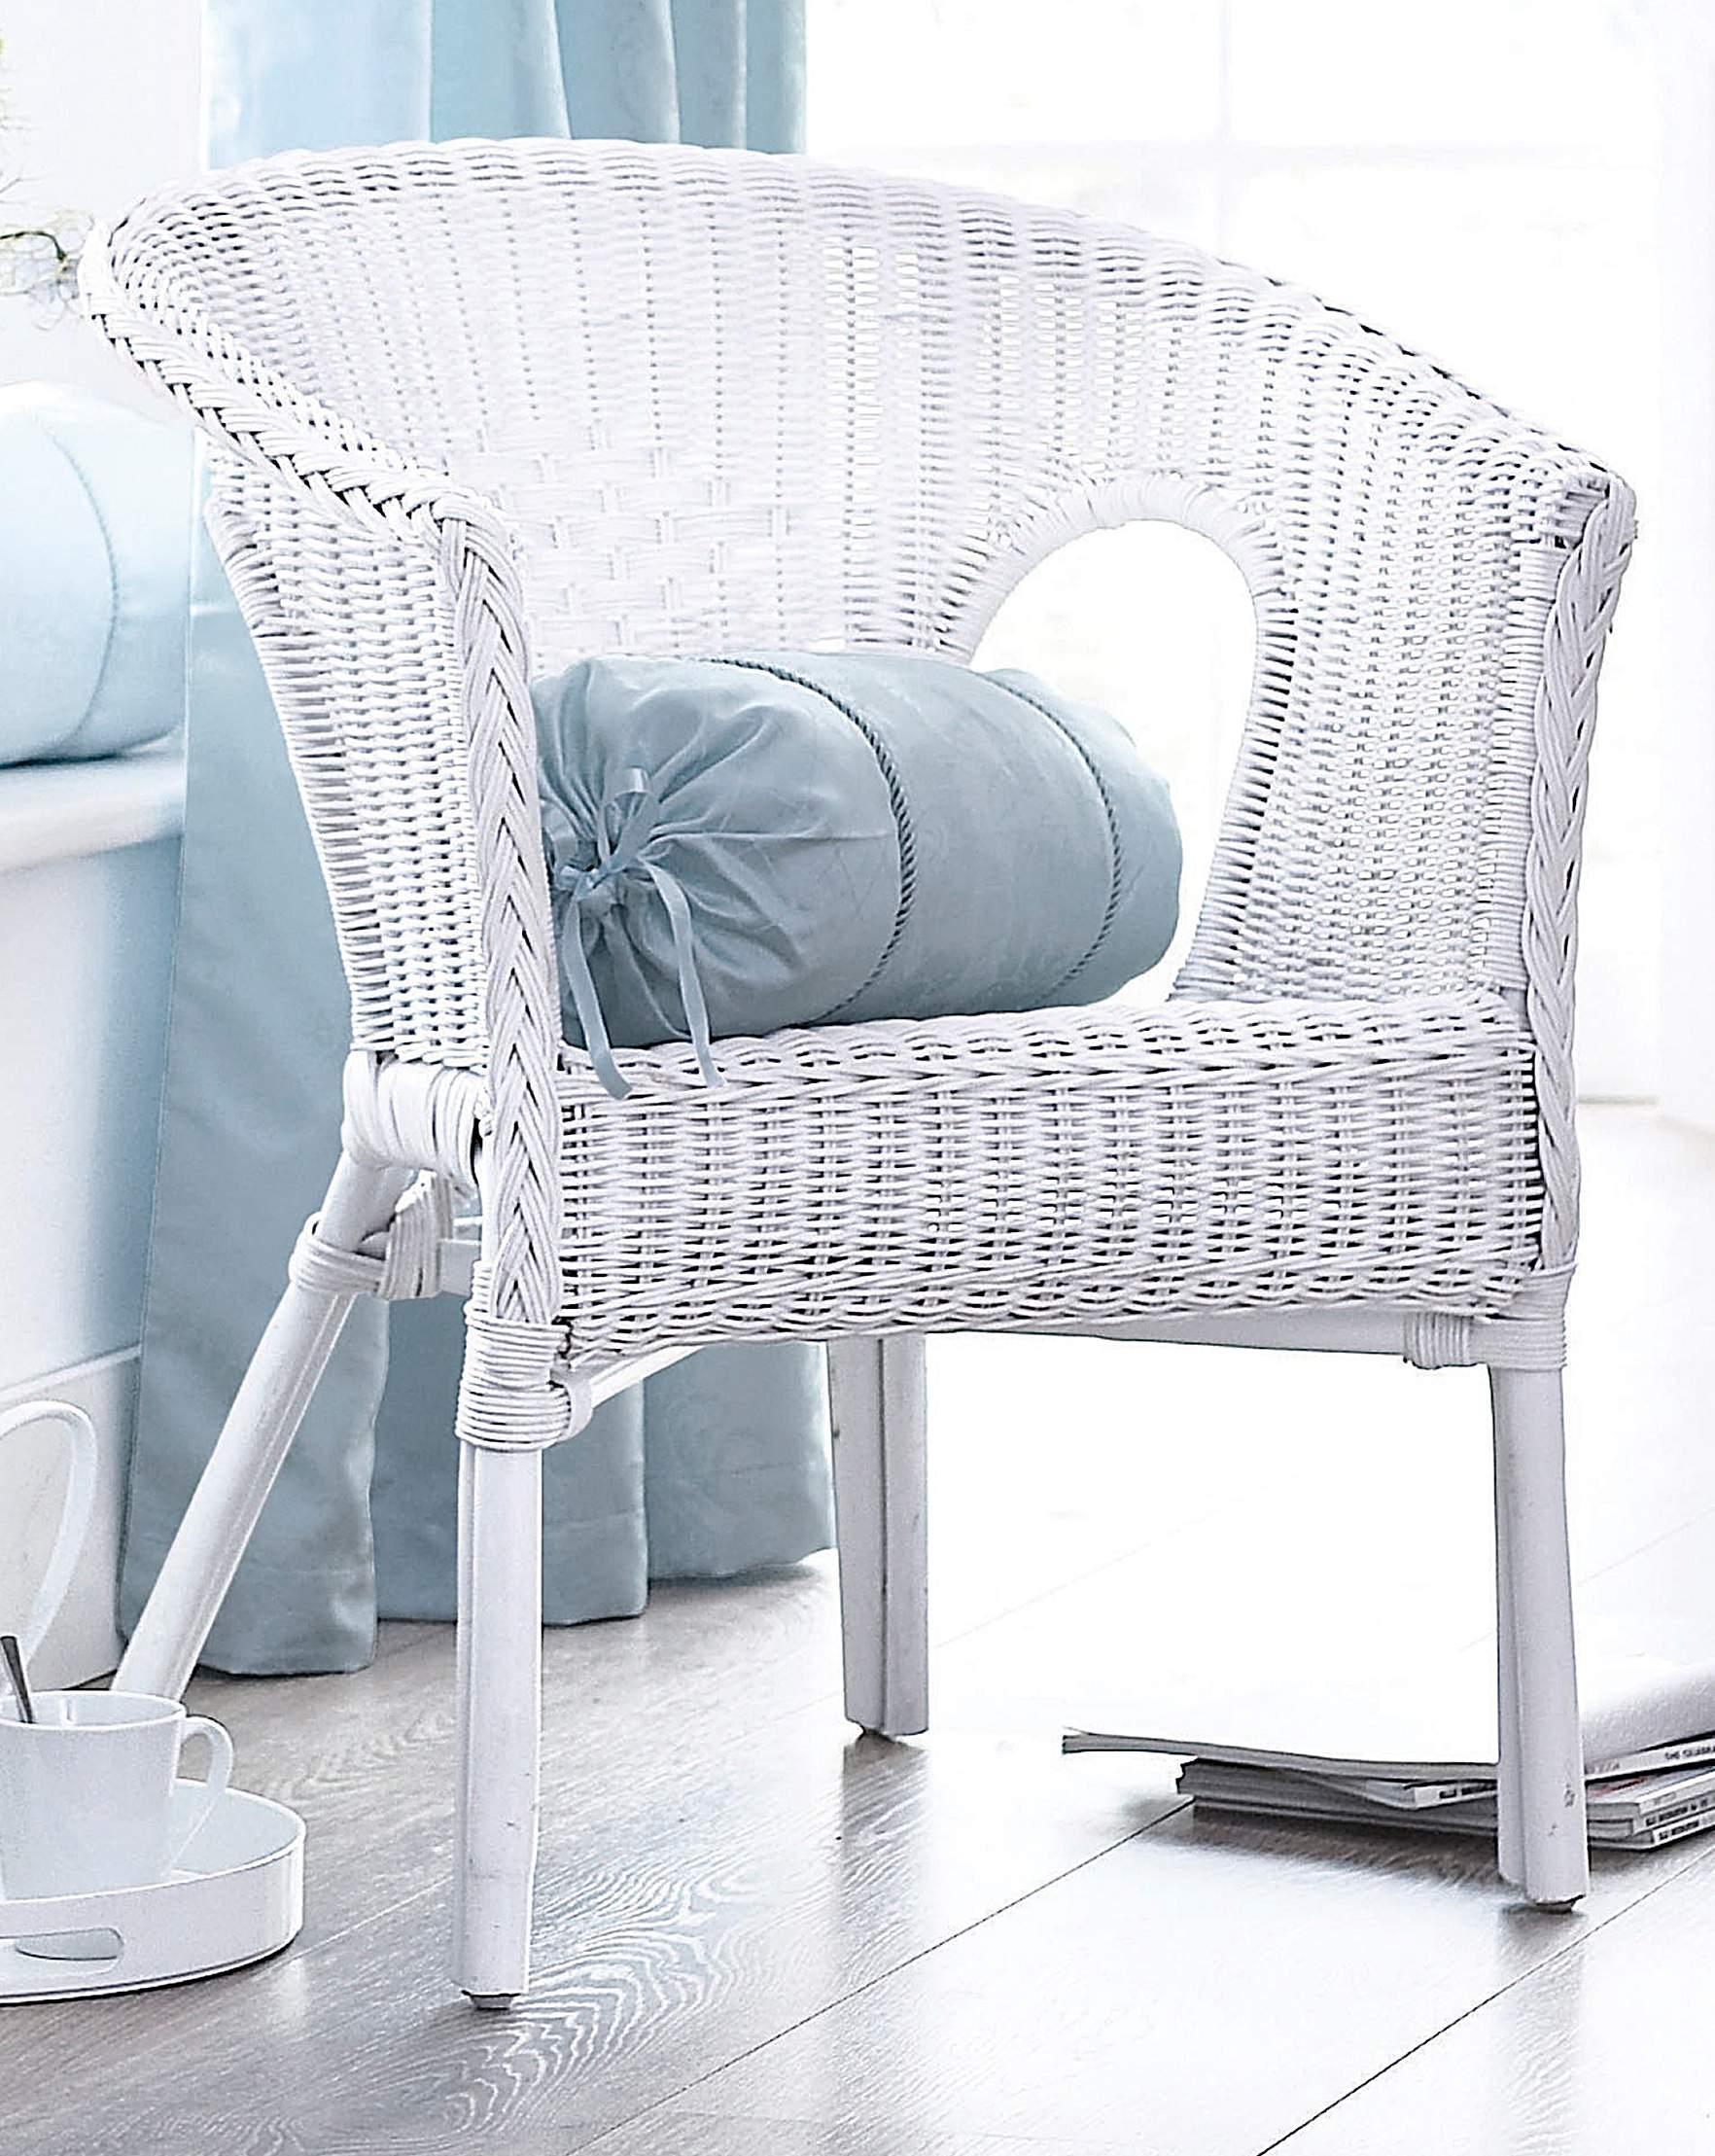 wicker chair house of bath - White Wicker Chair